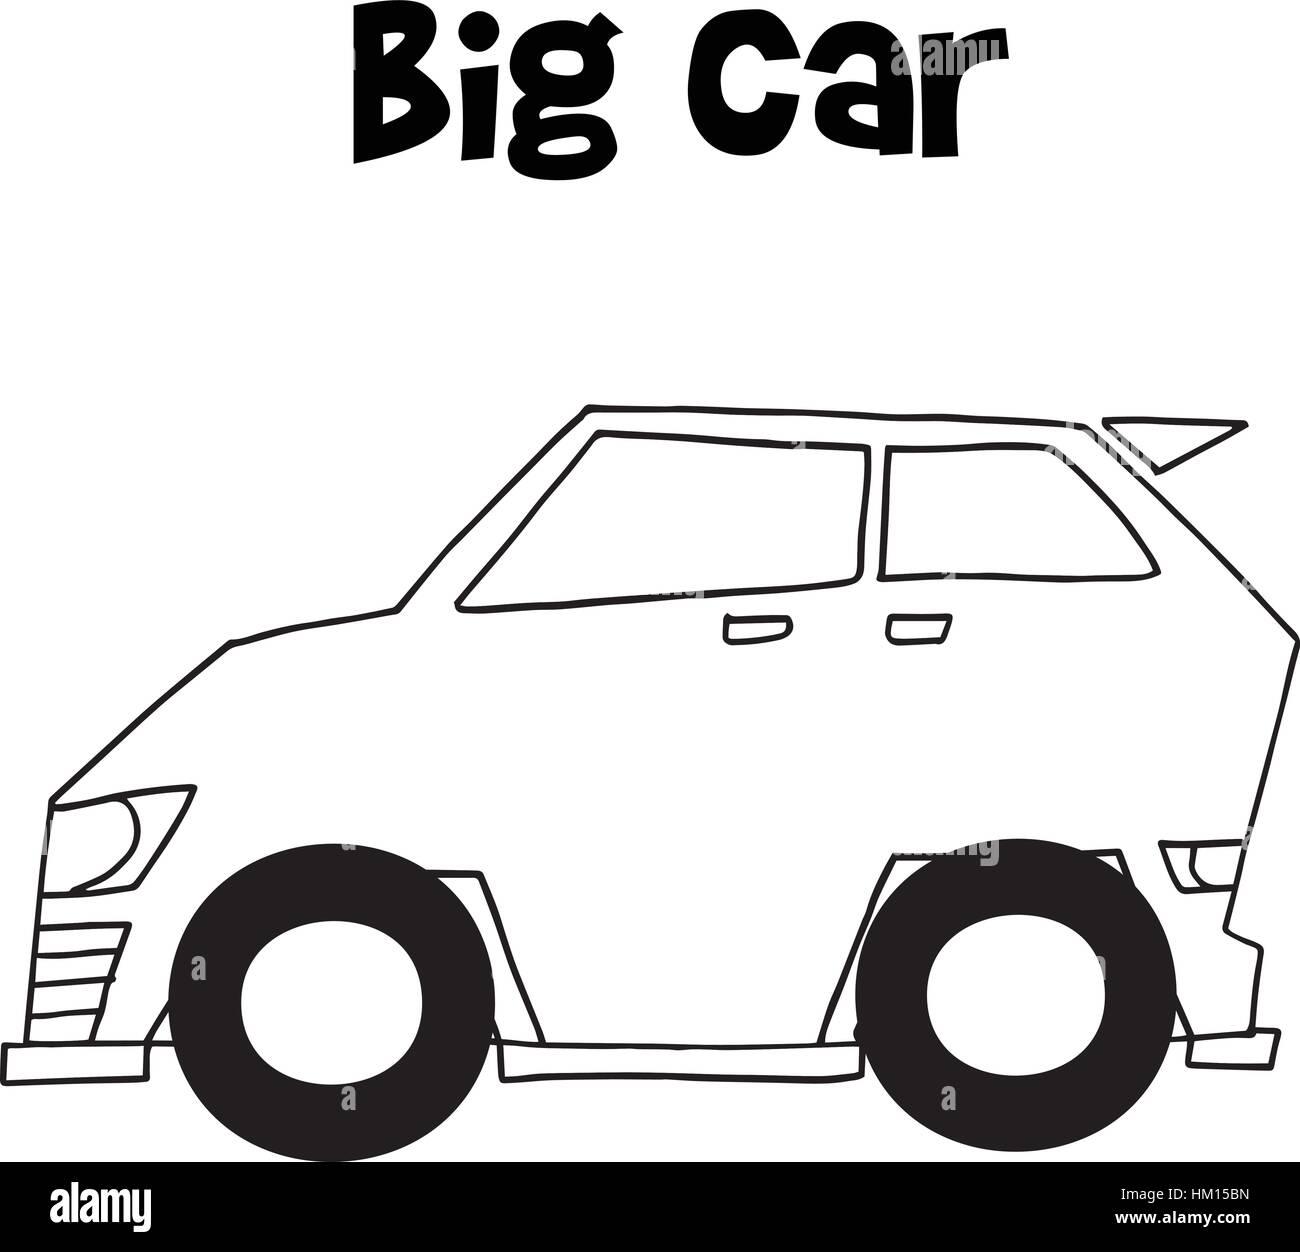 Big car vector art illustration - Stock Image